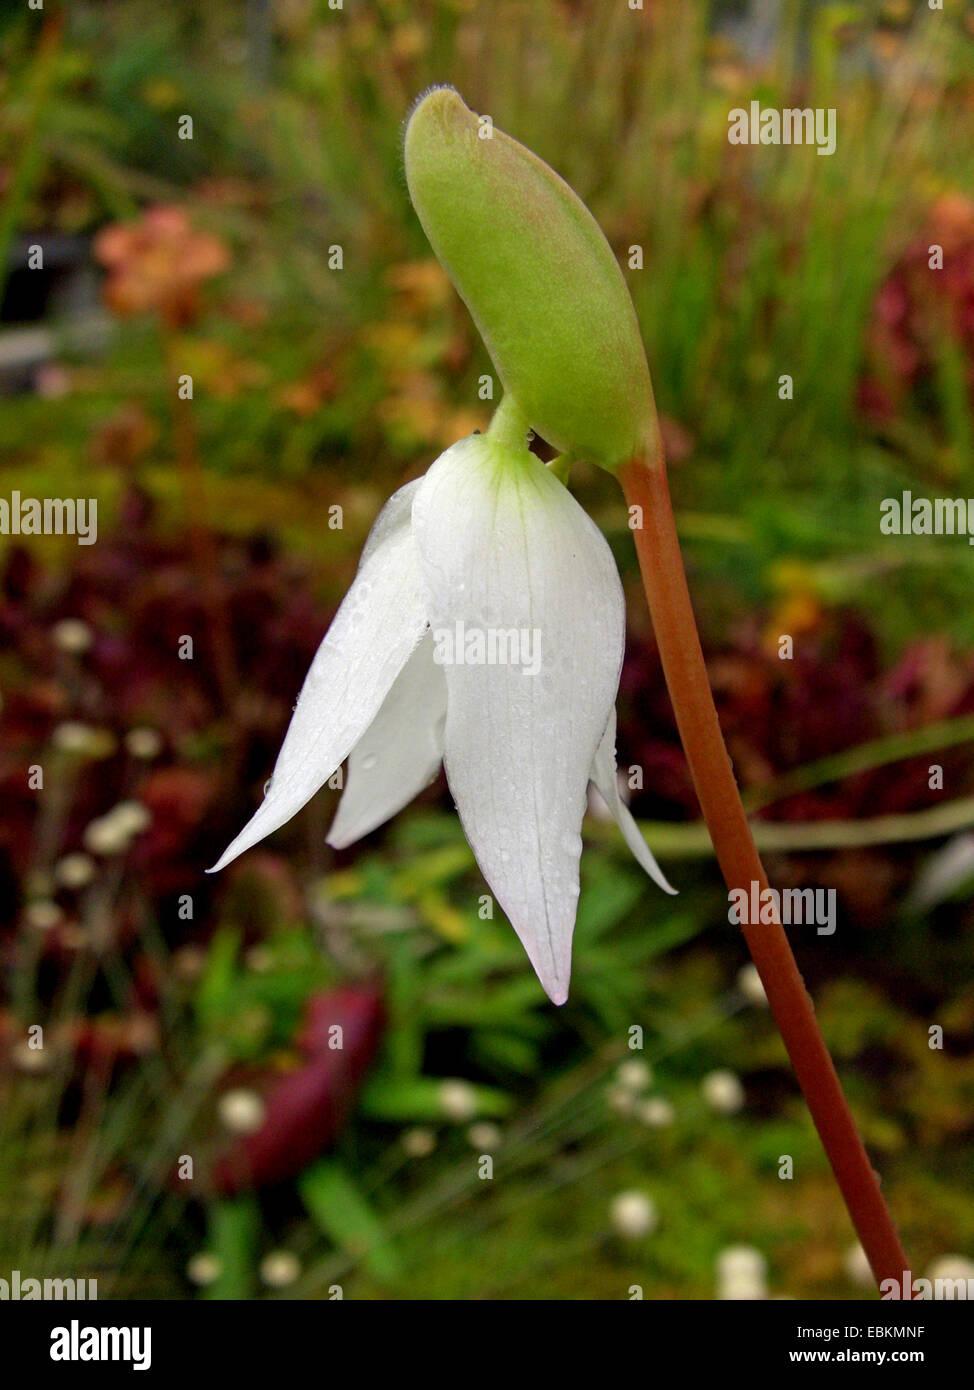 sun pitcher (Heliamphora nutans), flower - Stock Image